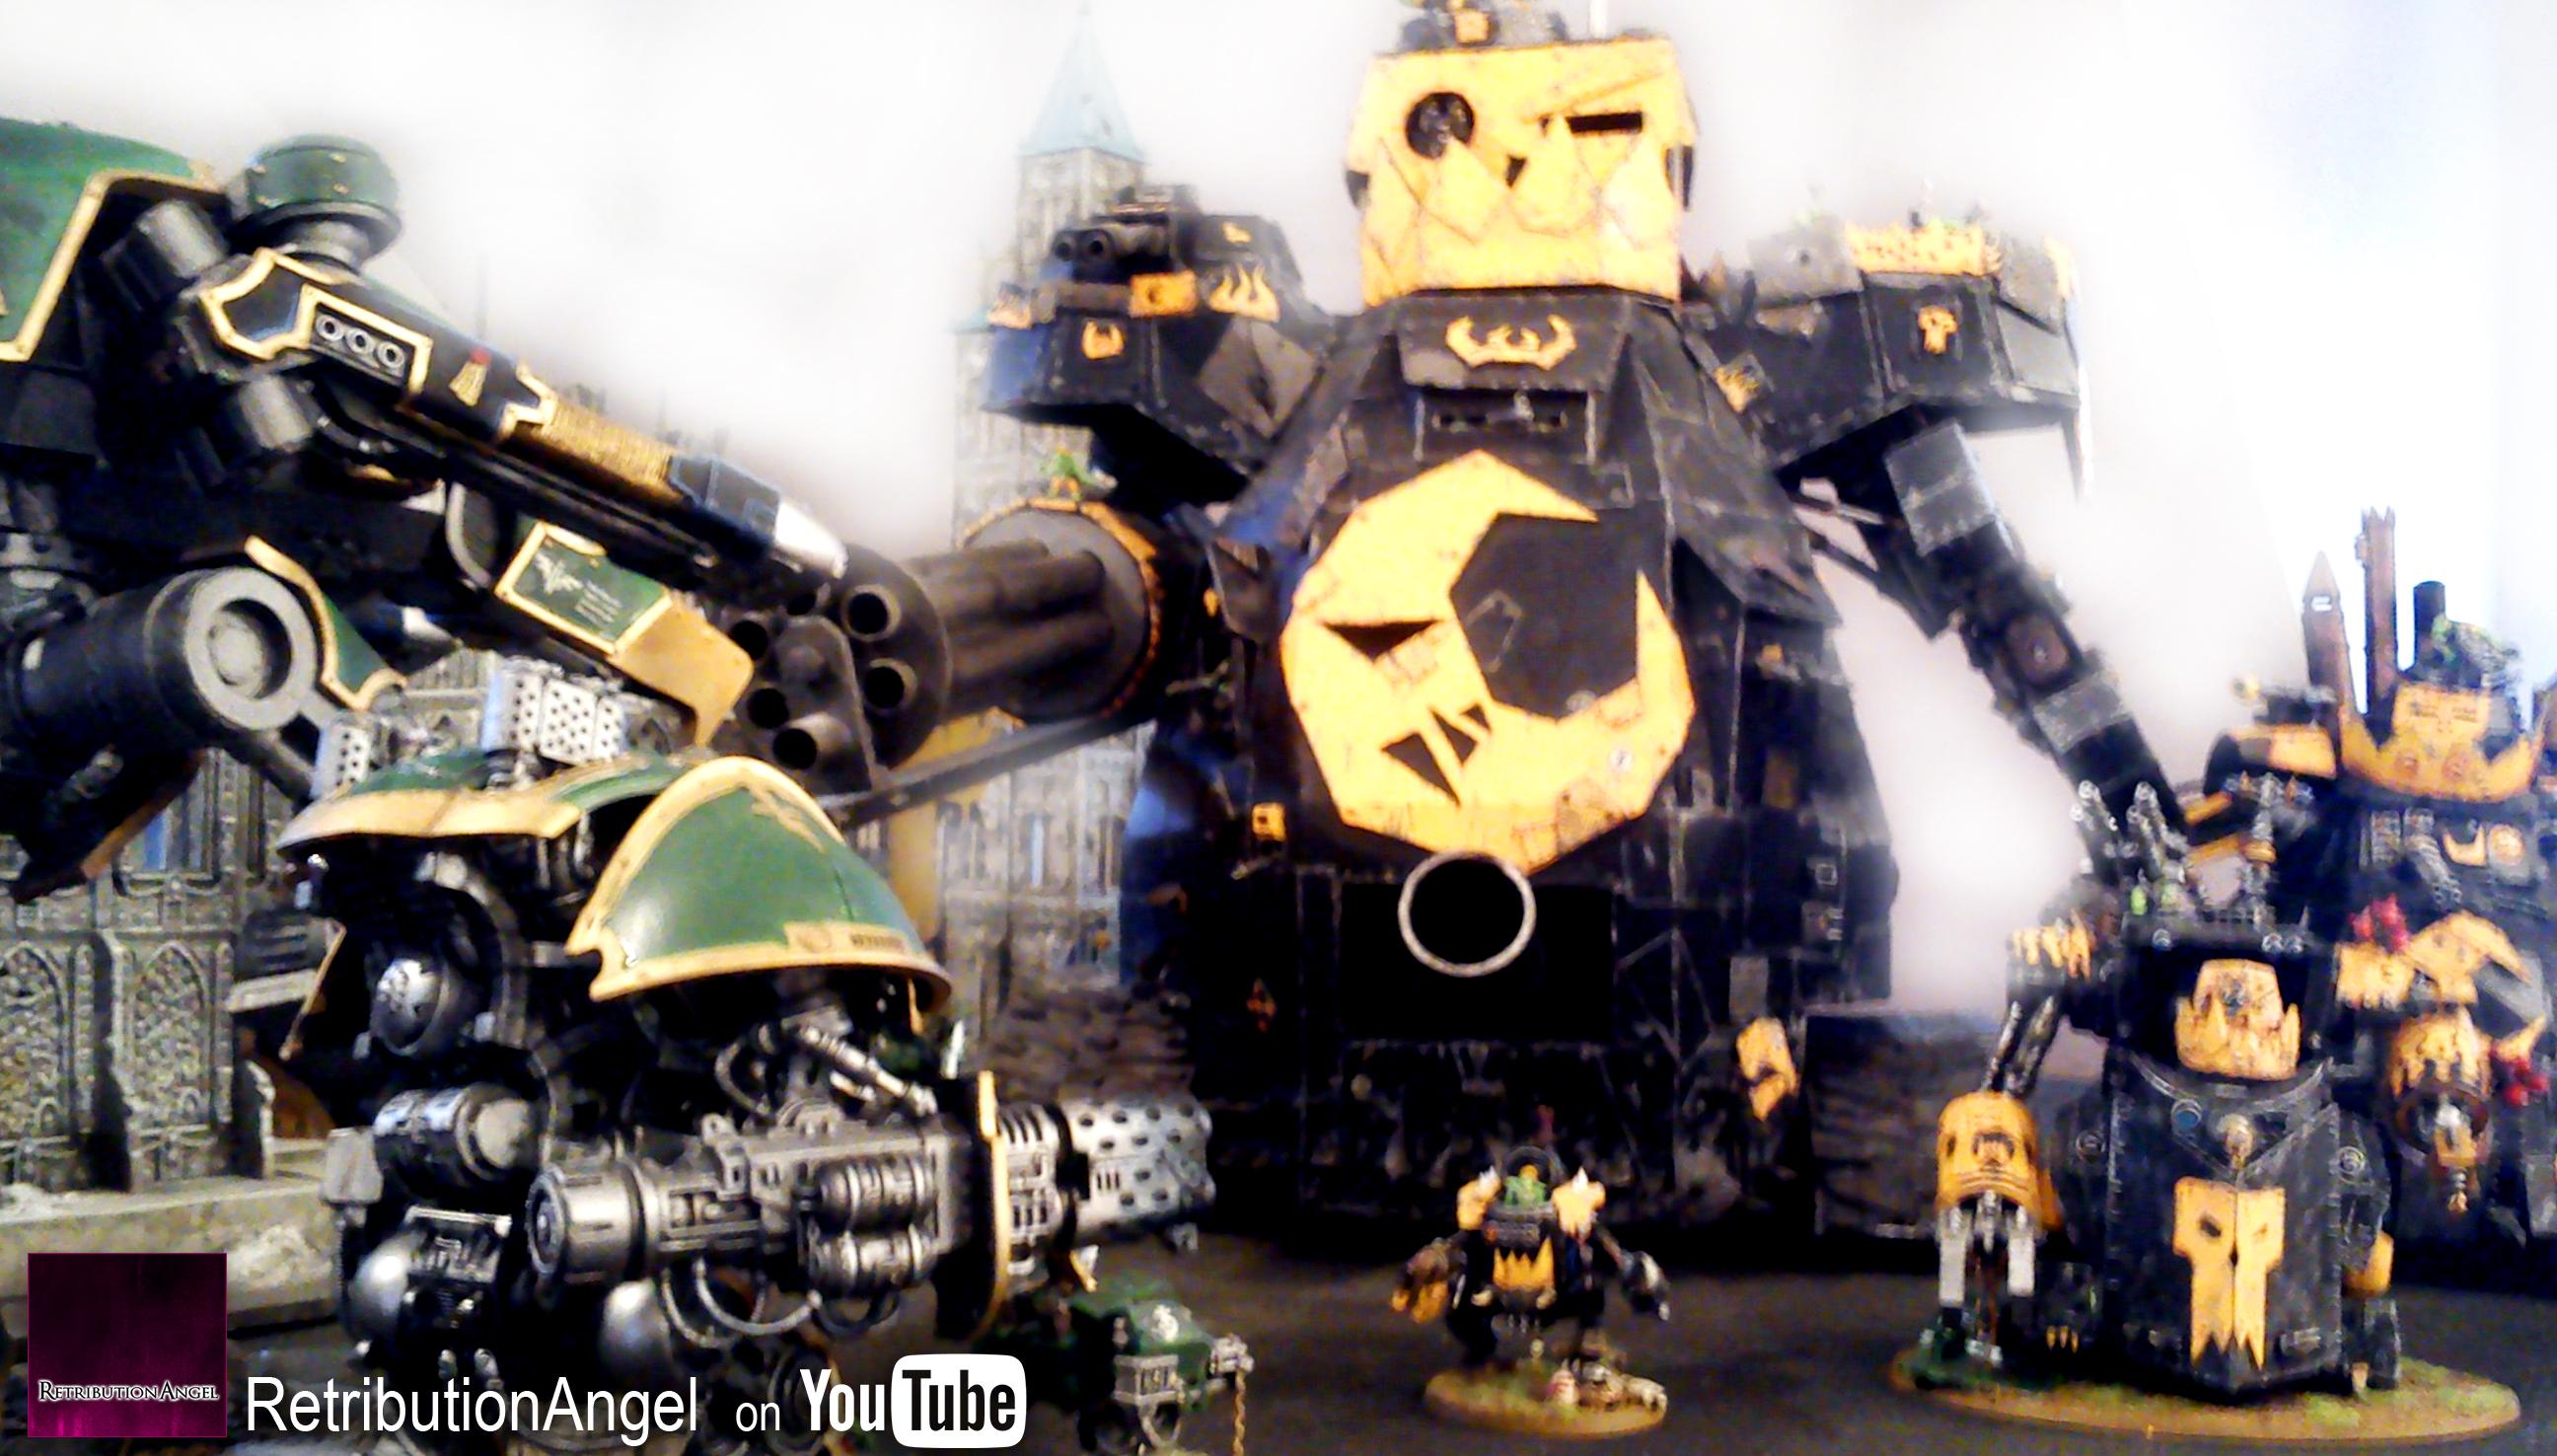 Gorkanout, Great Gargant, Morkanout, Orks, Stompa, Warhammer 40,000